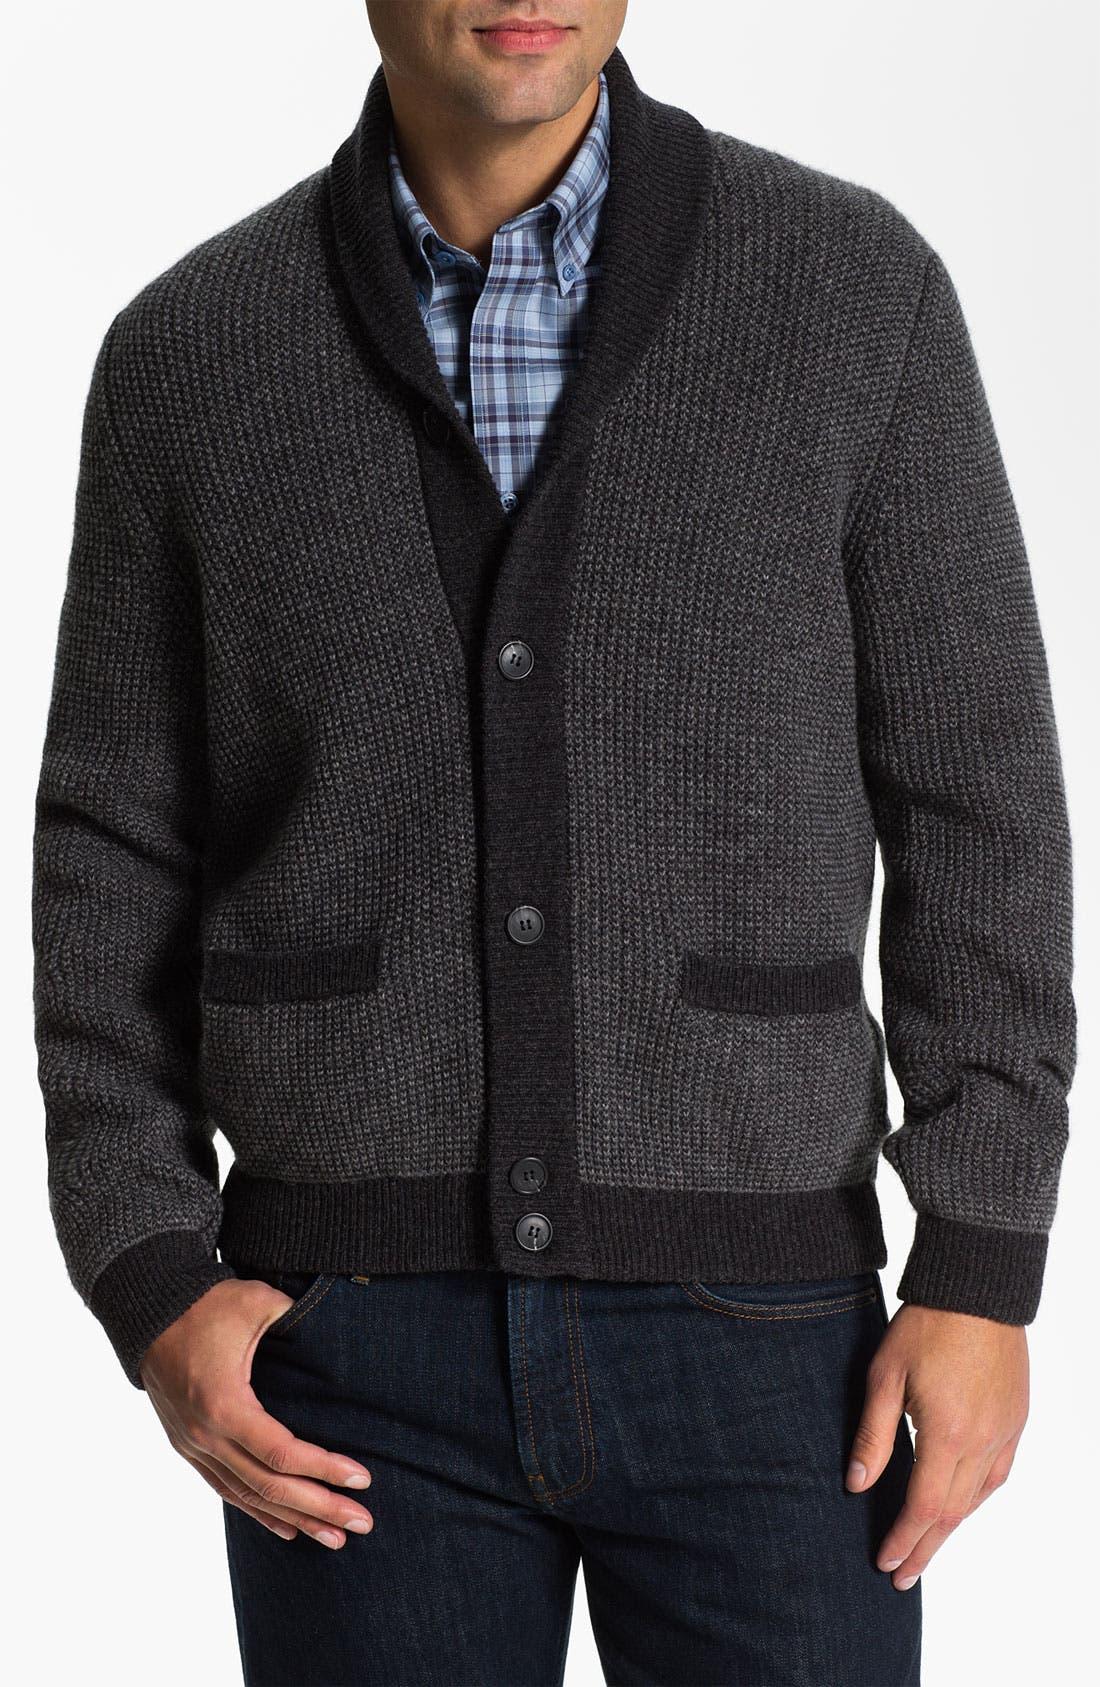 Alternate Image 1 Selected - Lora Gi Shawl Collar Wool Cardigan